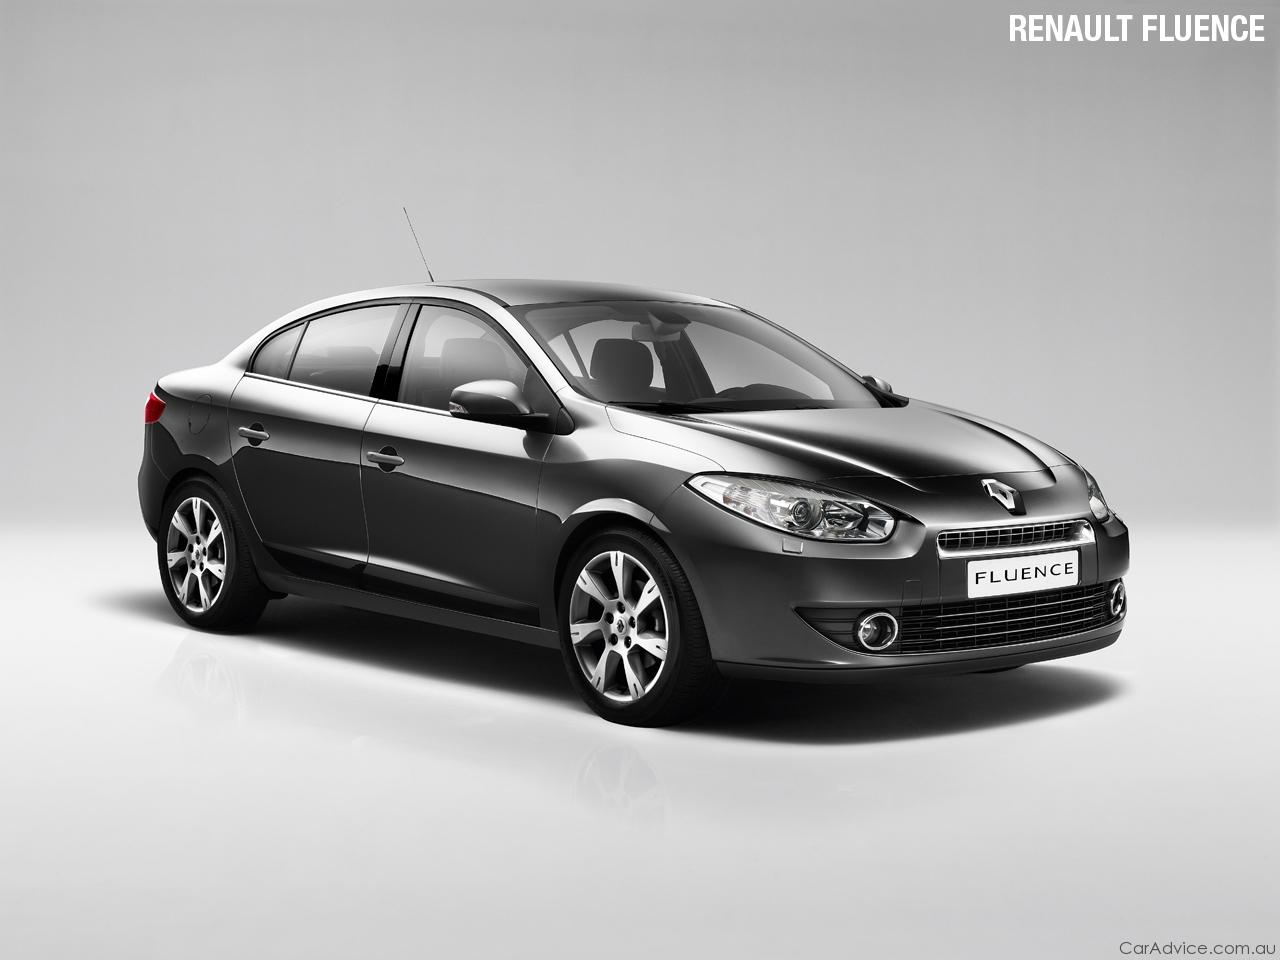 2010 Renault Fluence Partsopen